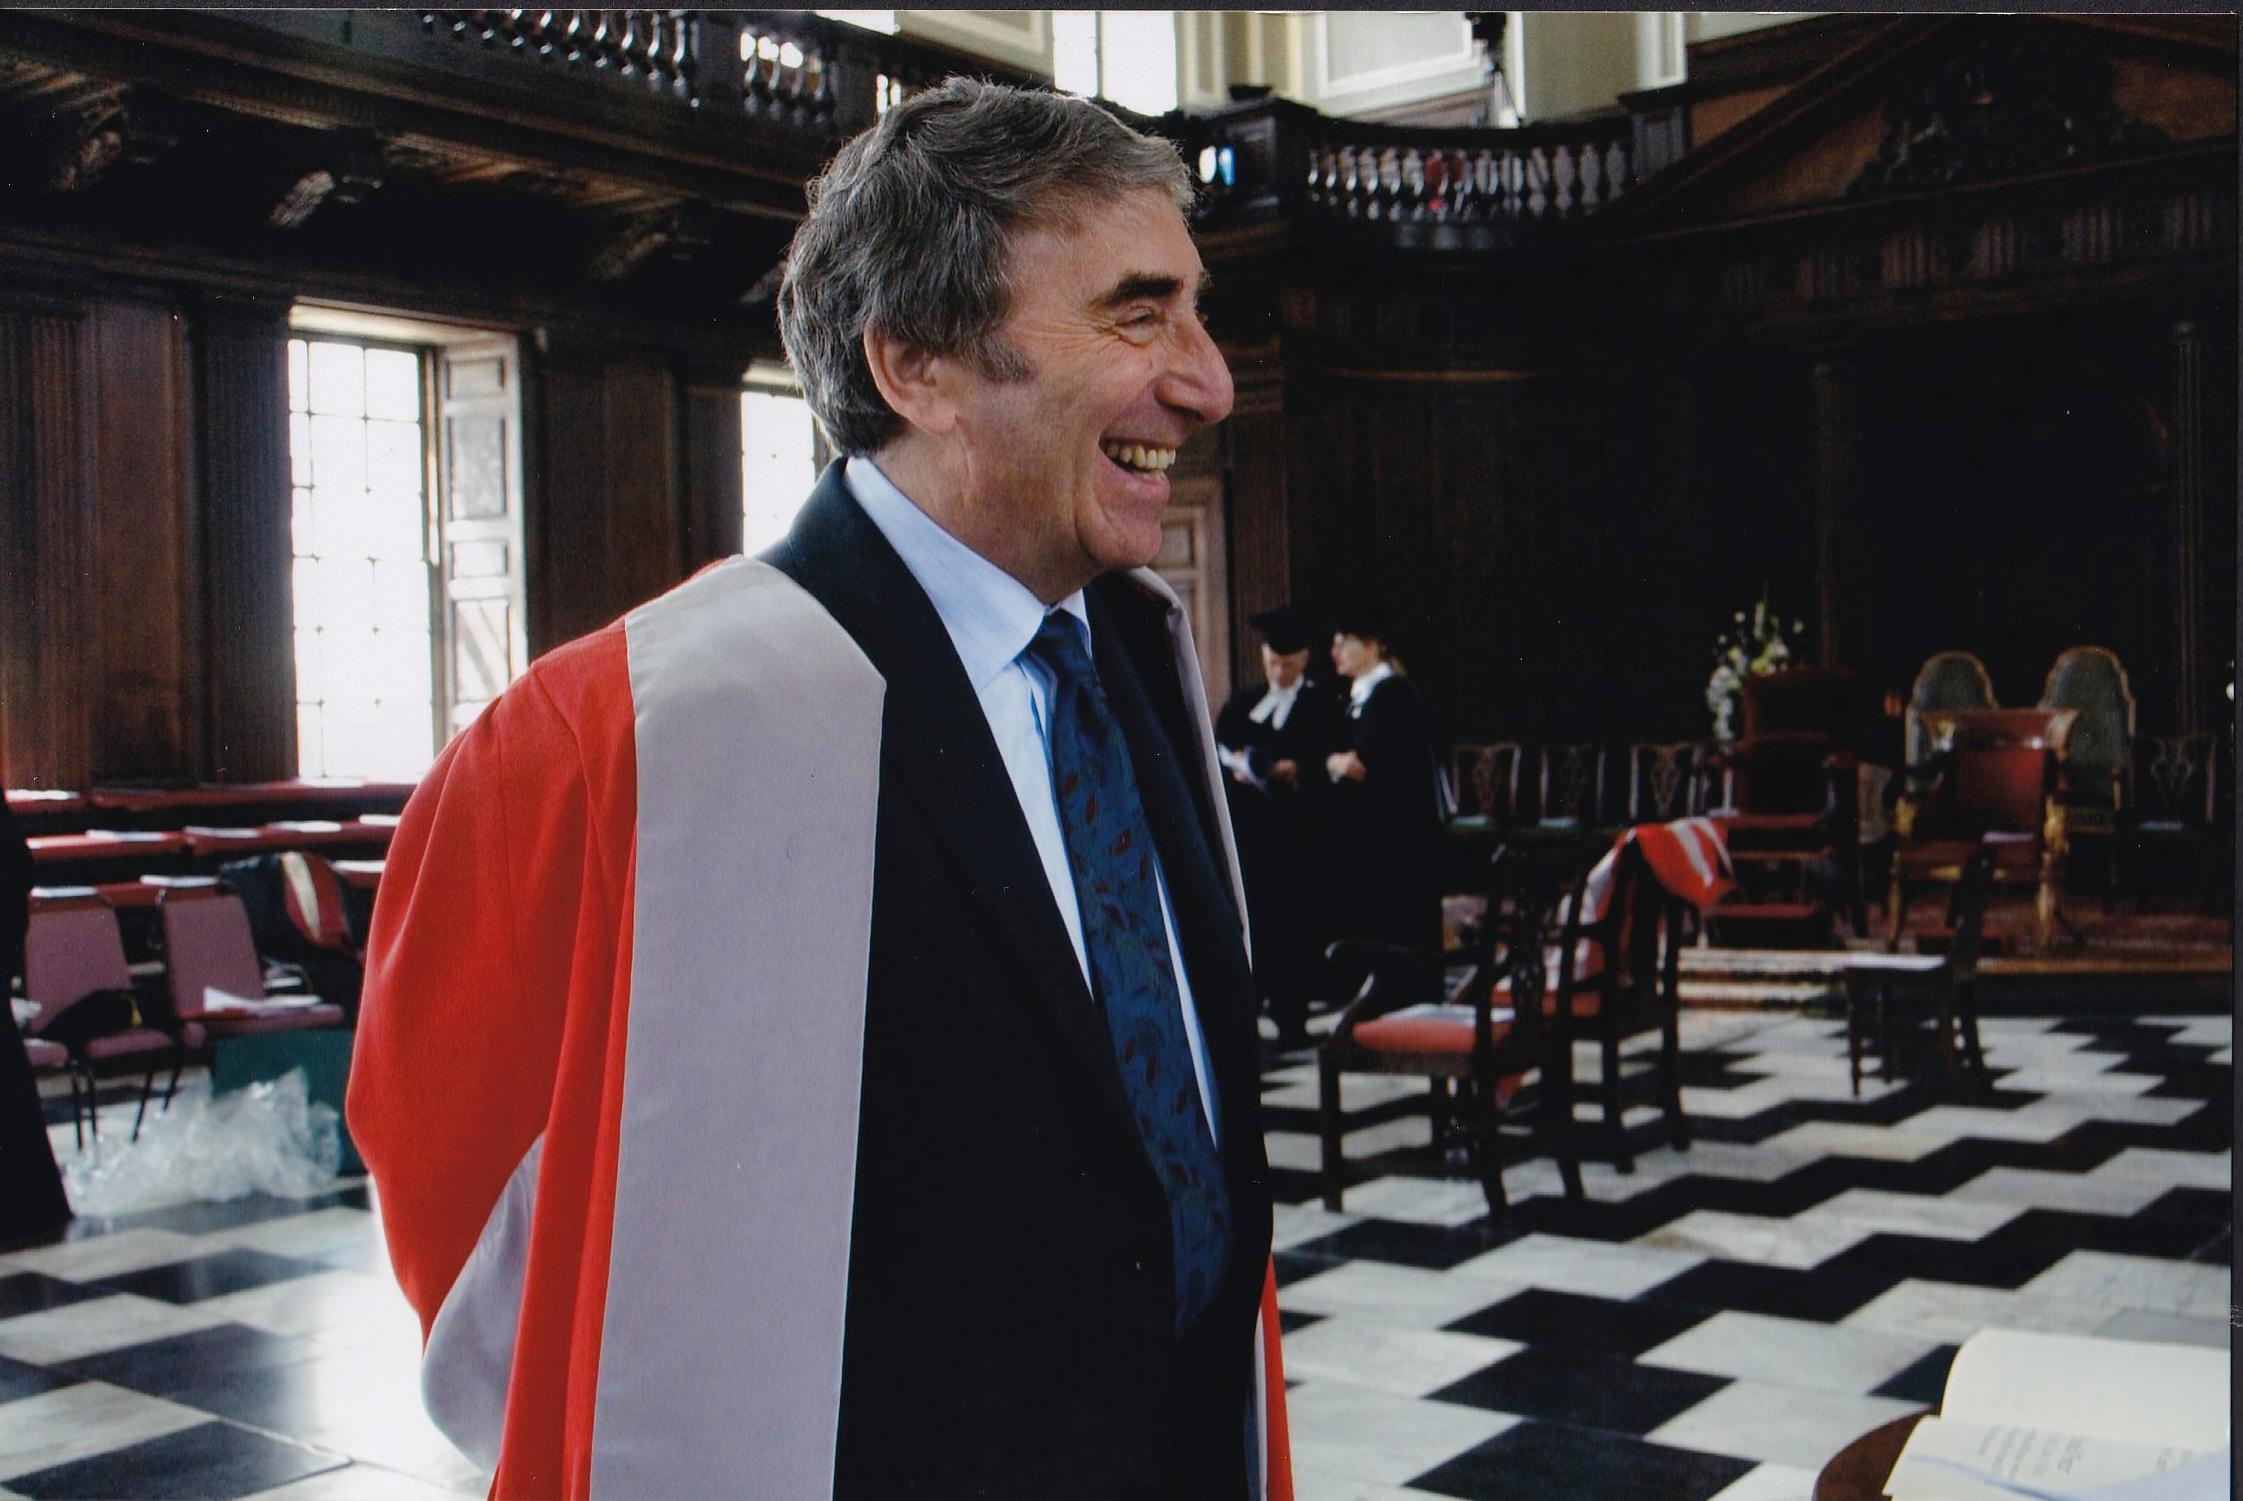 Photograph of Herman Waldmann getting his honorary doctorate at Cambridge University, 2009